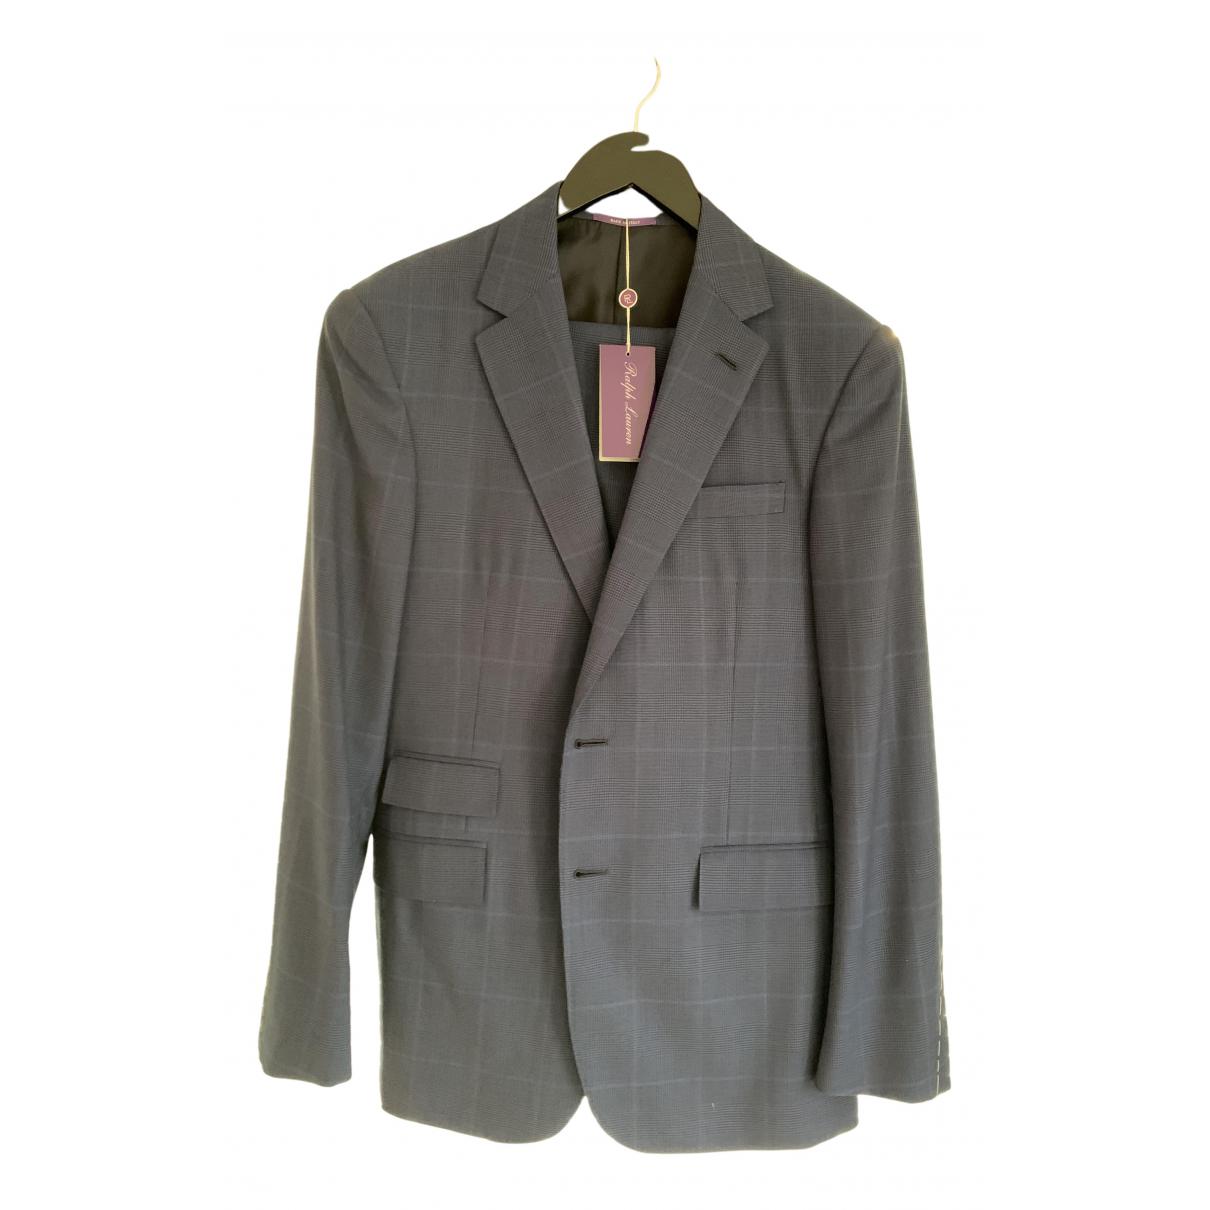 Ralph Lauren Purple Label N Blue Wool Suits for Men 38 UK - US